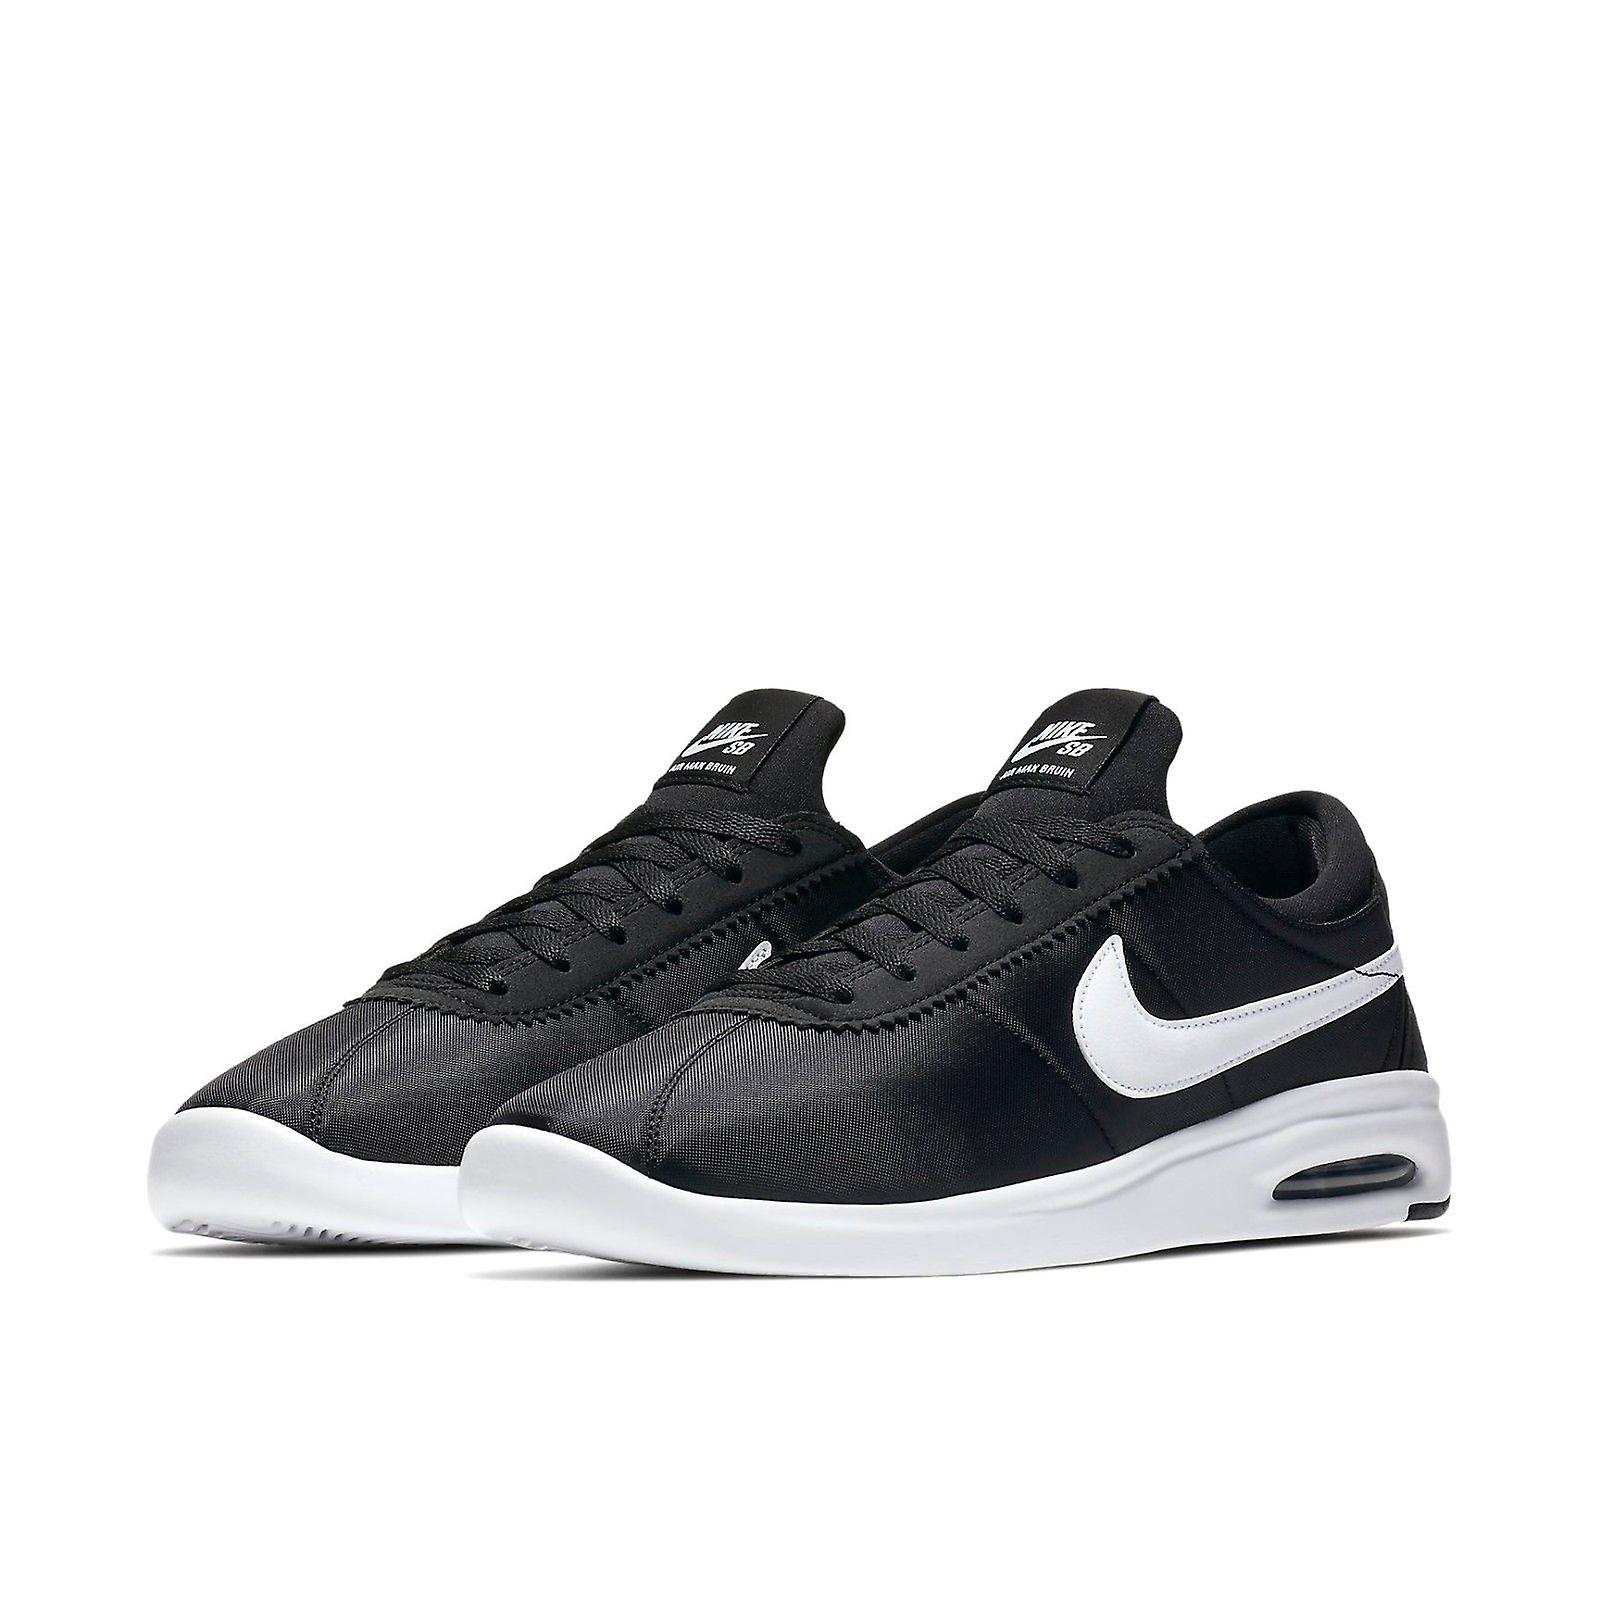 Nike SB Air Max Bruin VPR TXT AA4257 001 Mens Trainers